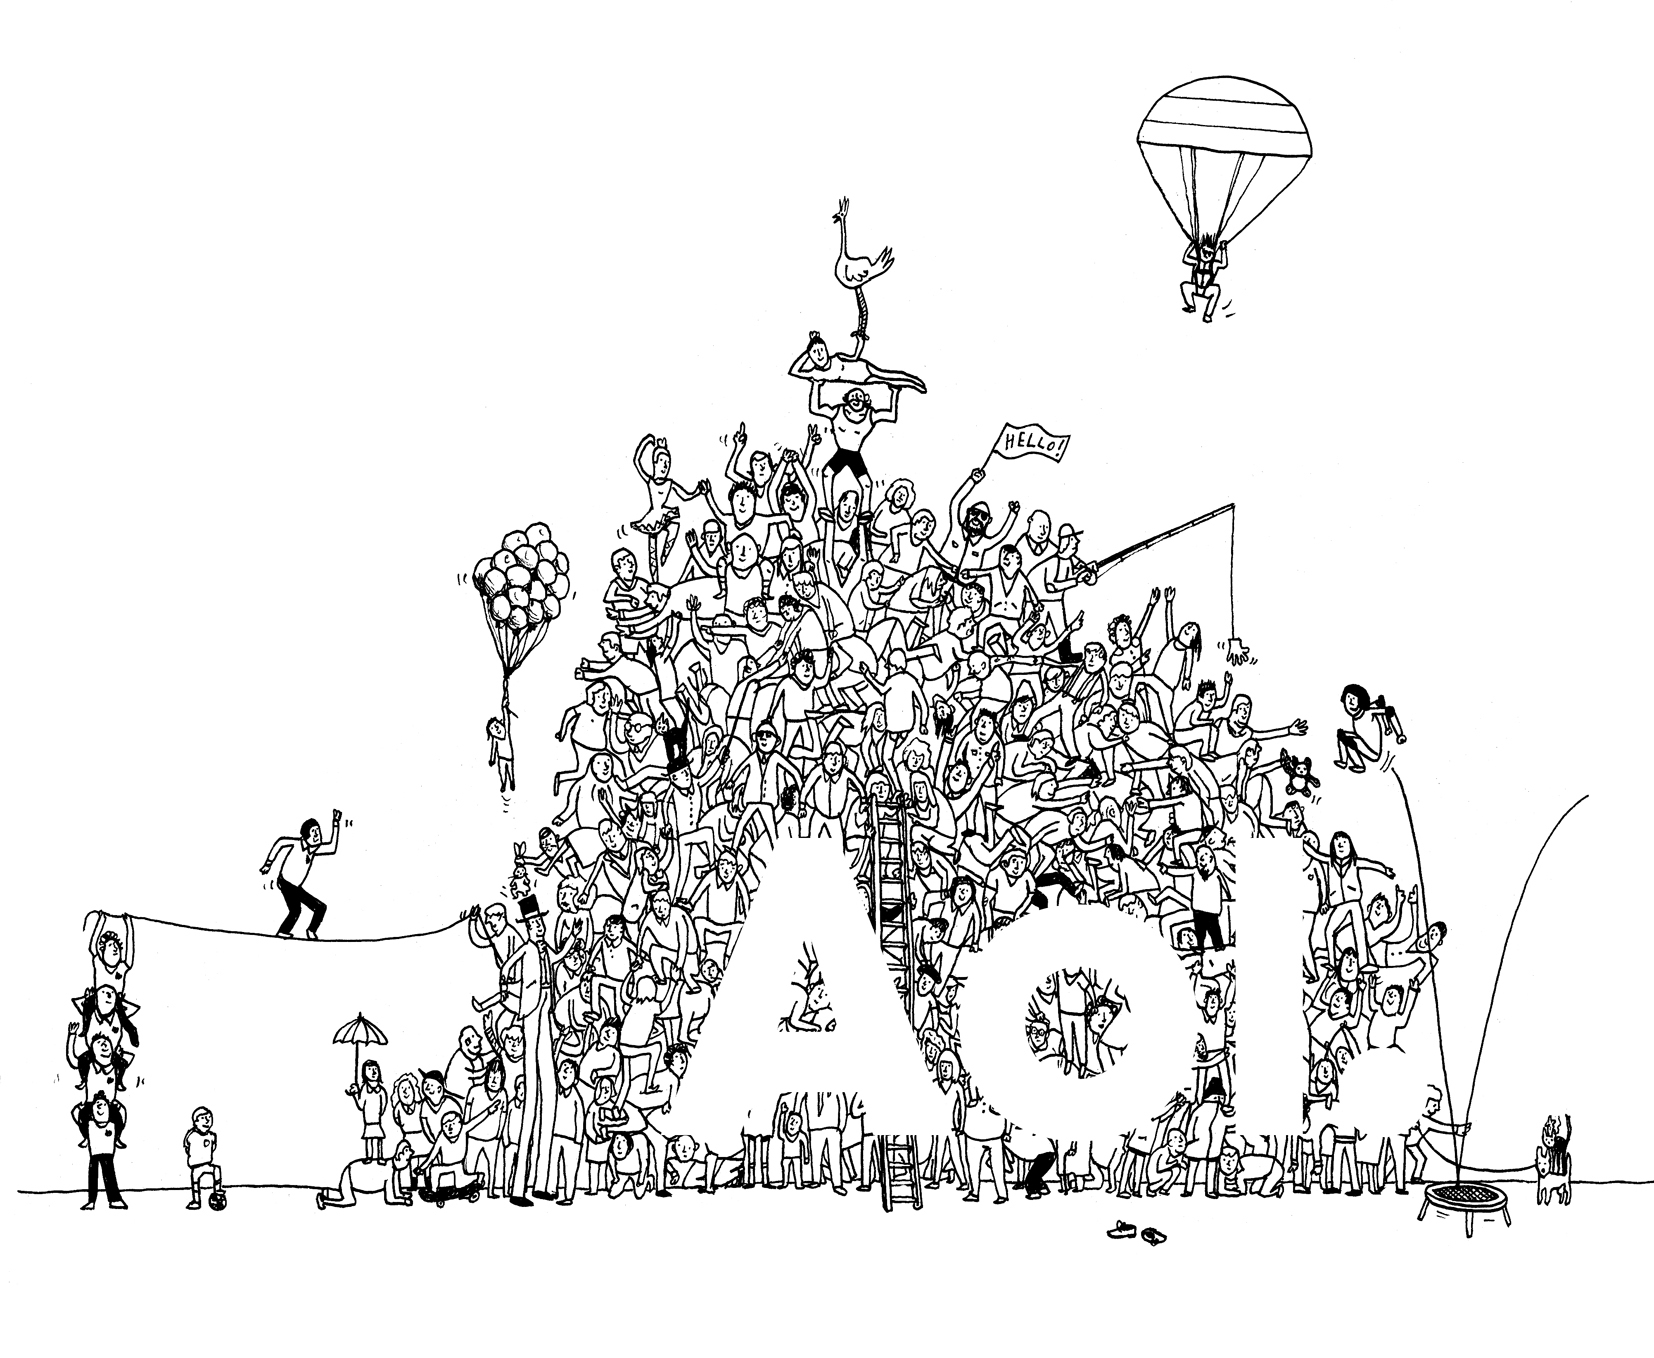 Aol. Pile Up